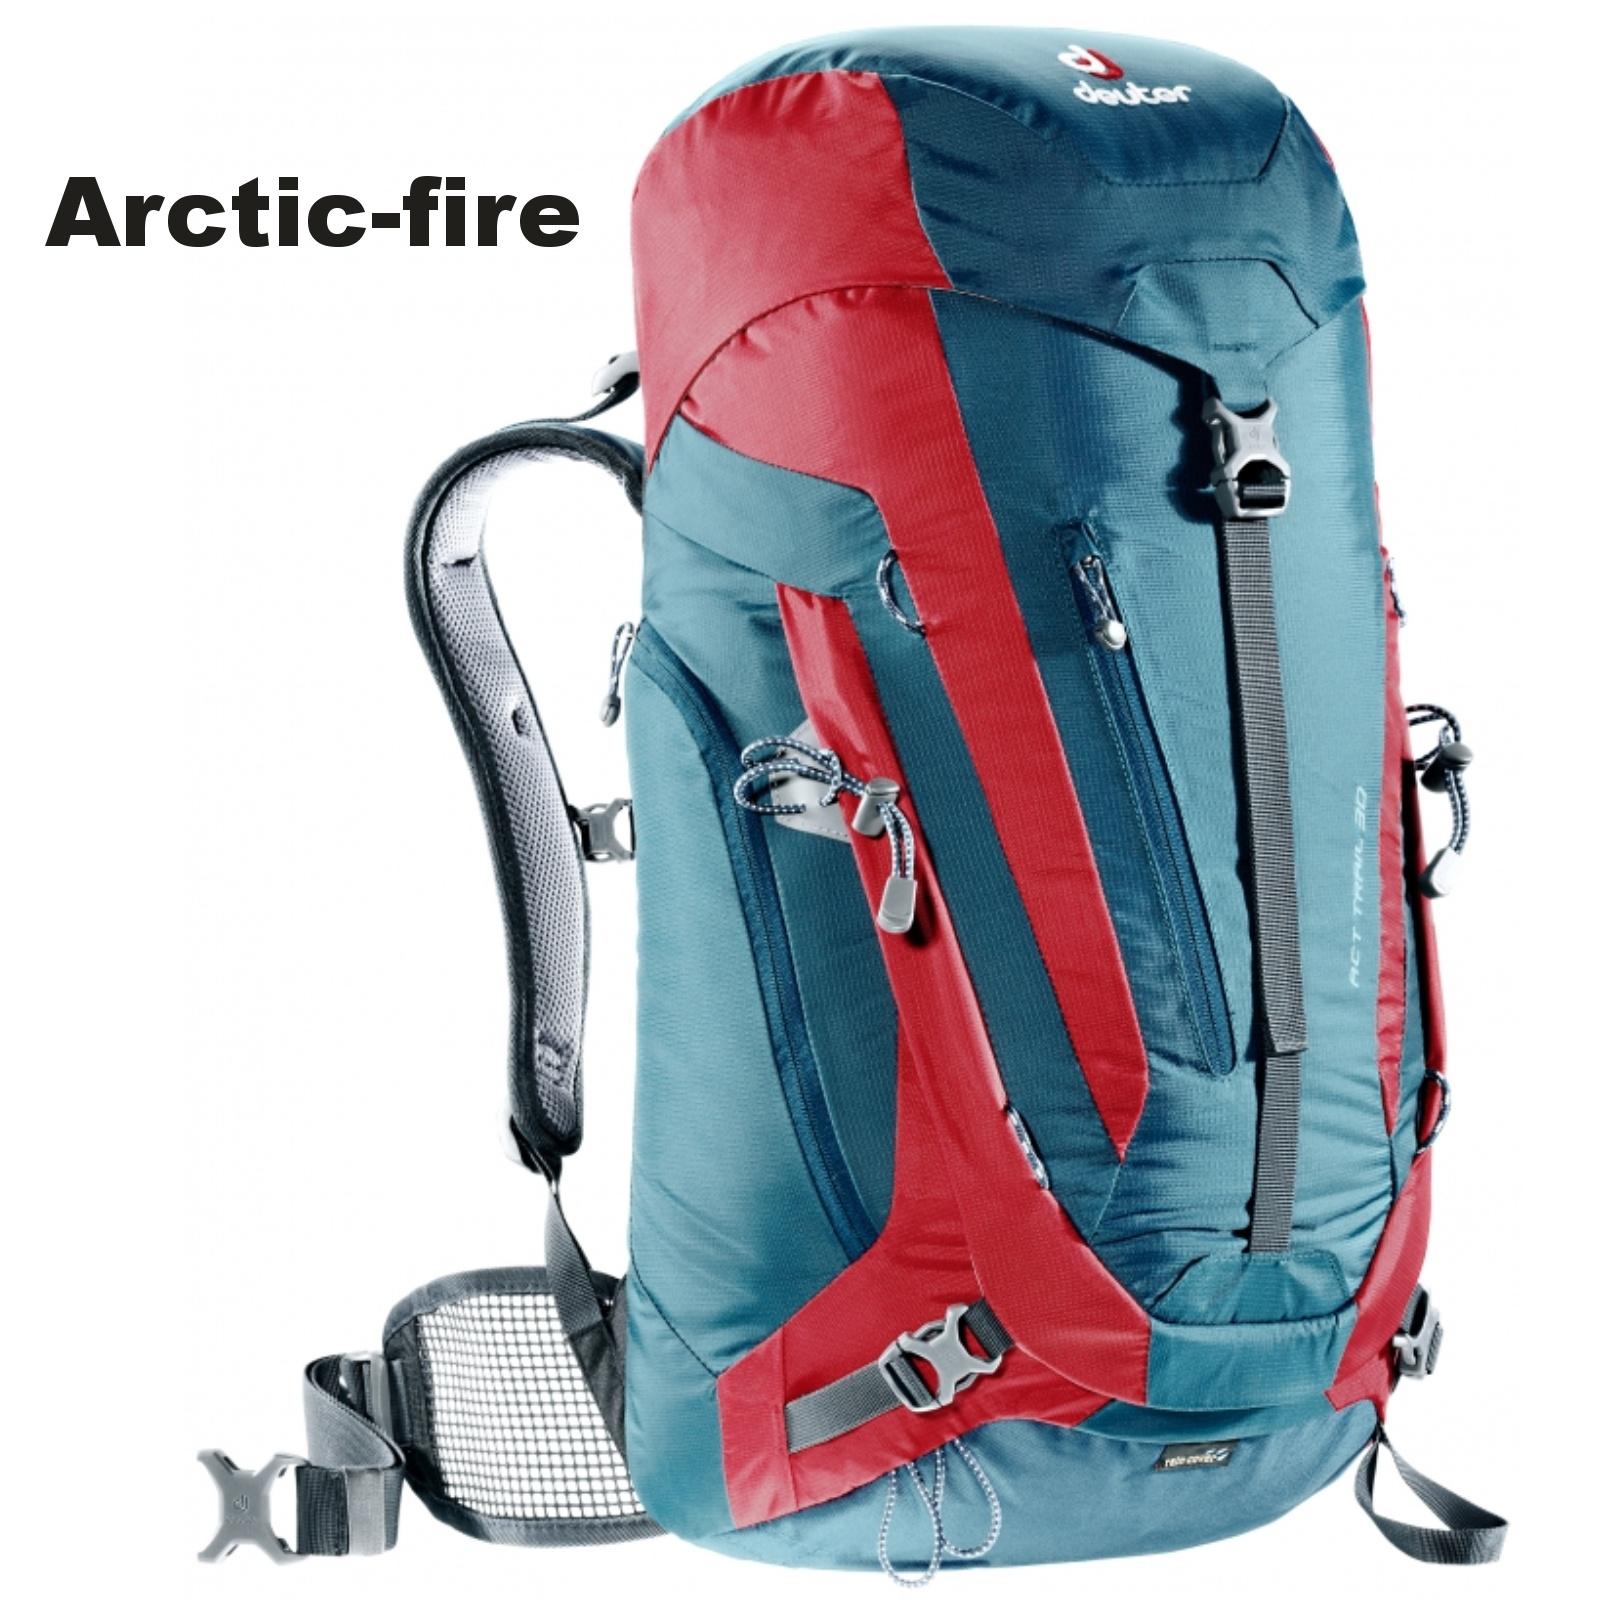 Batoh DEUTER ACT TRAIL 30 l - arctic-fire